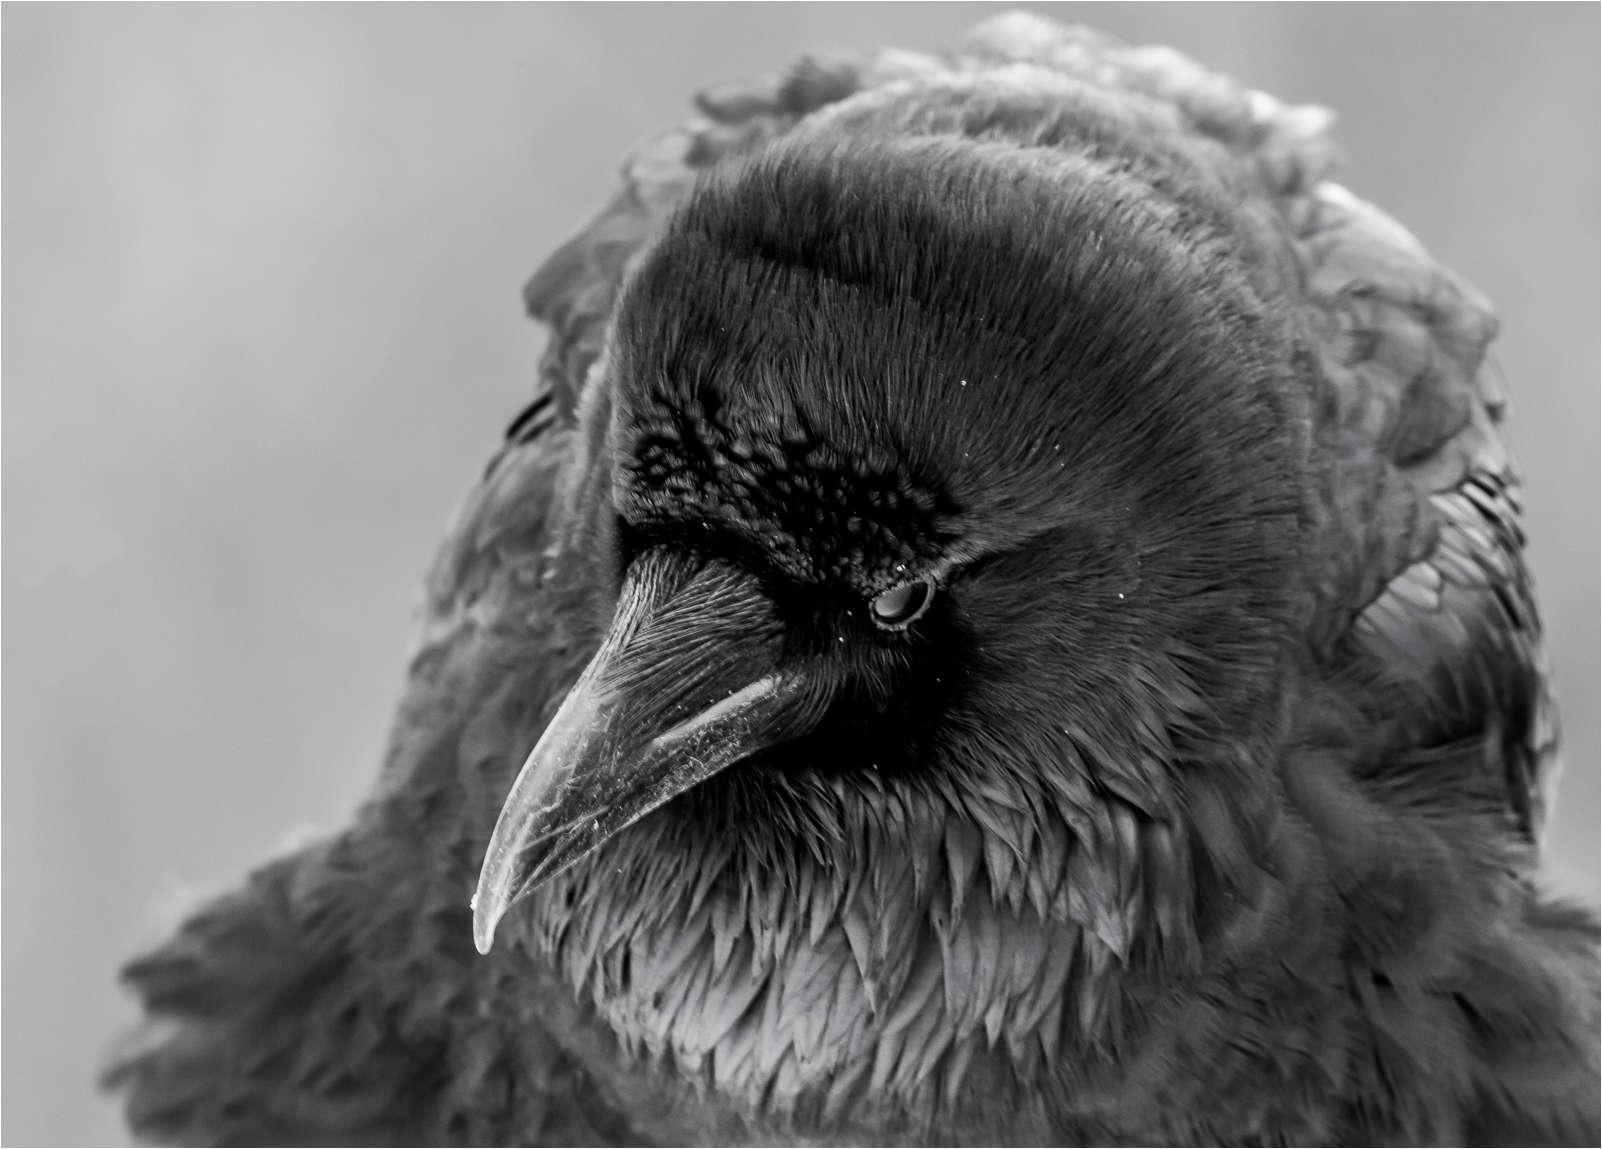 Drawn raven winter Christopher Sharing Photography Ravens Martin